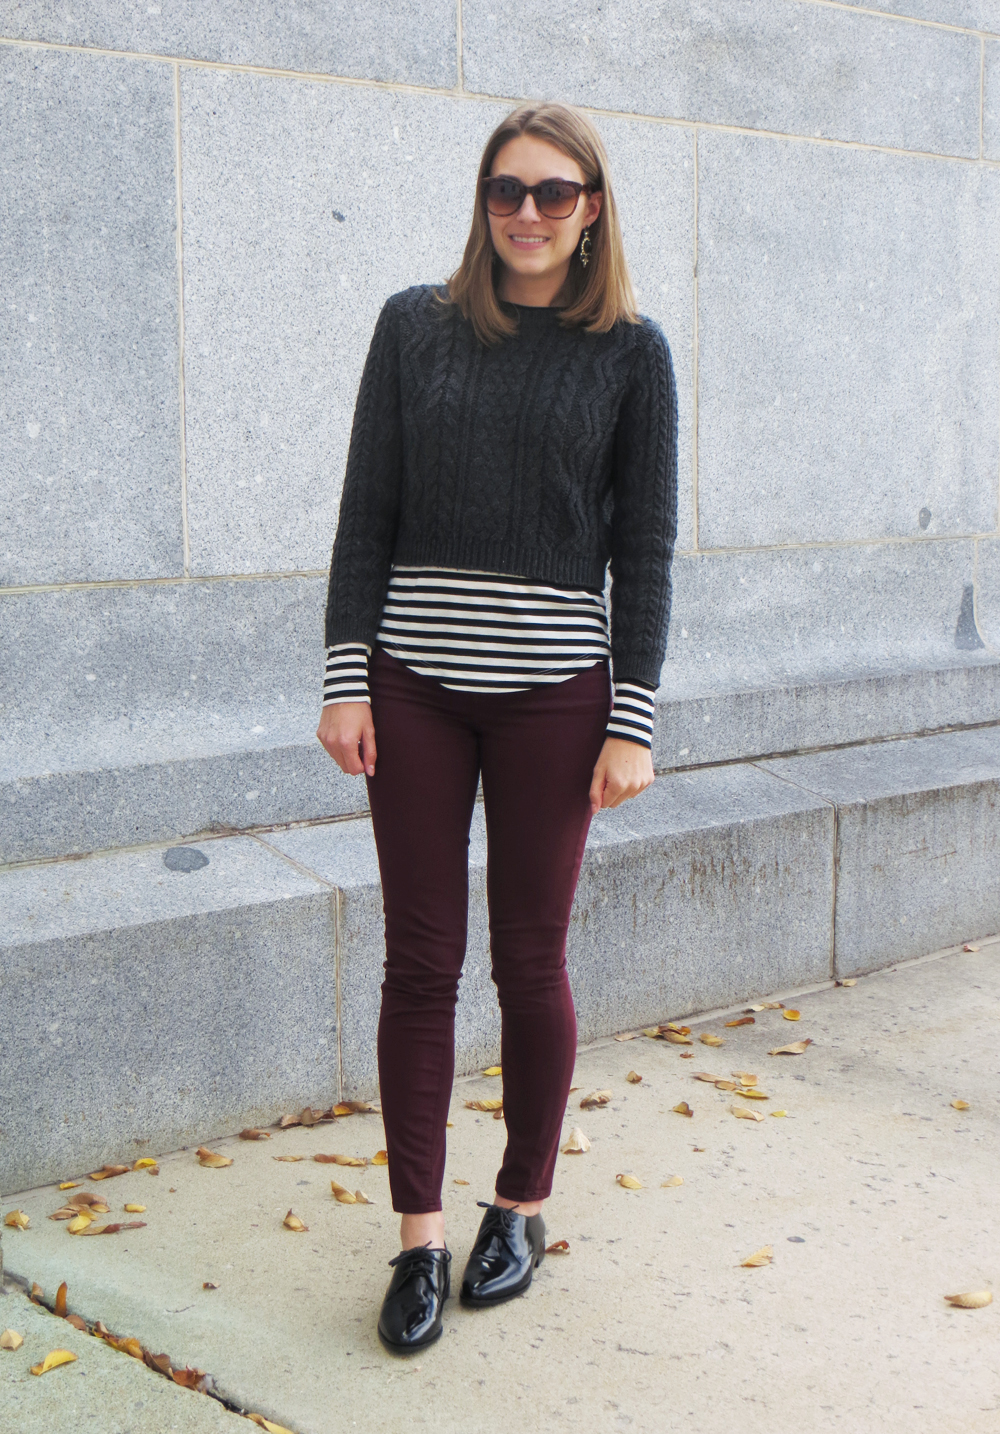 Shiny & striped